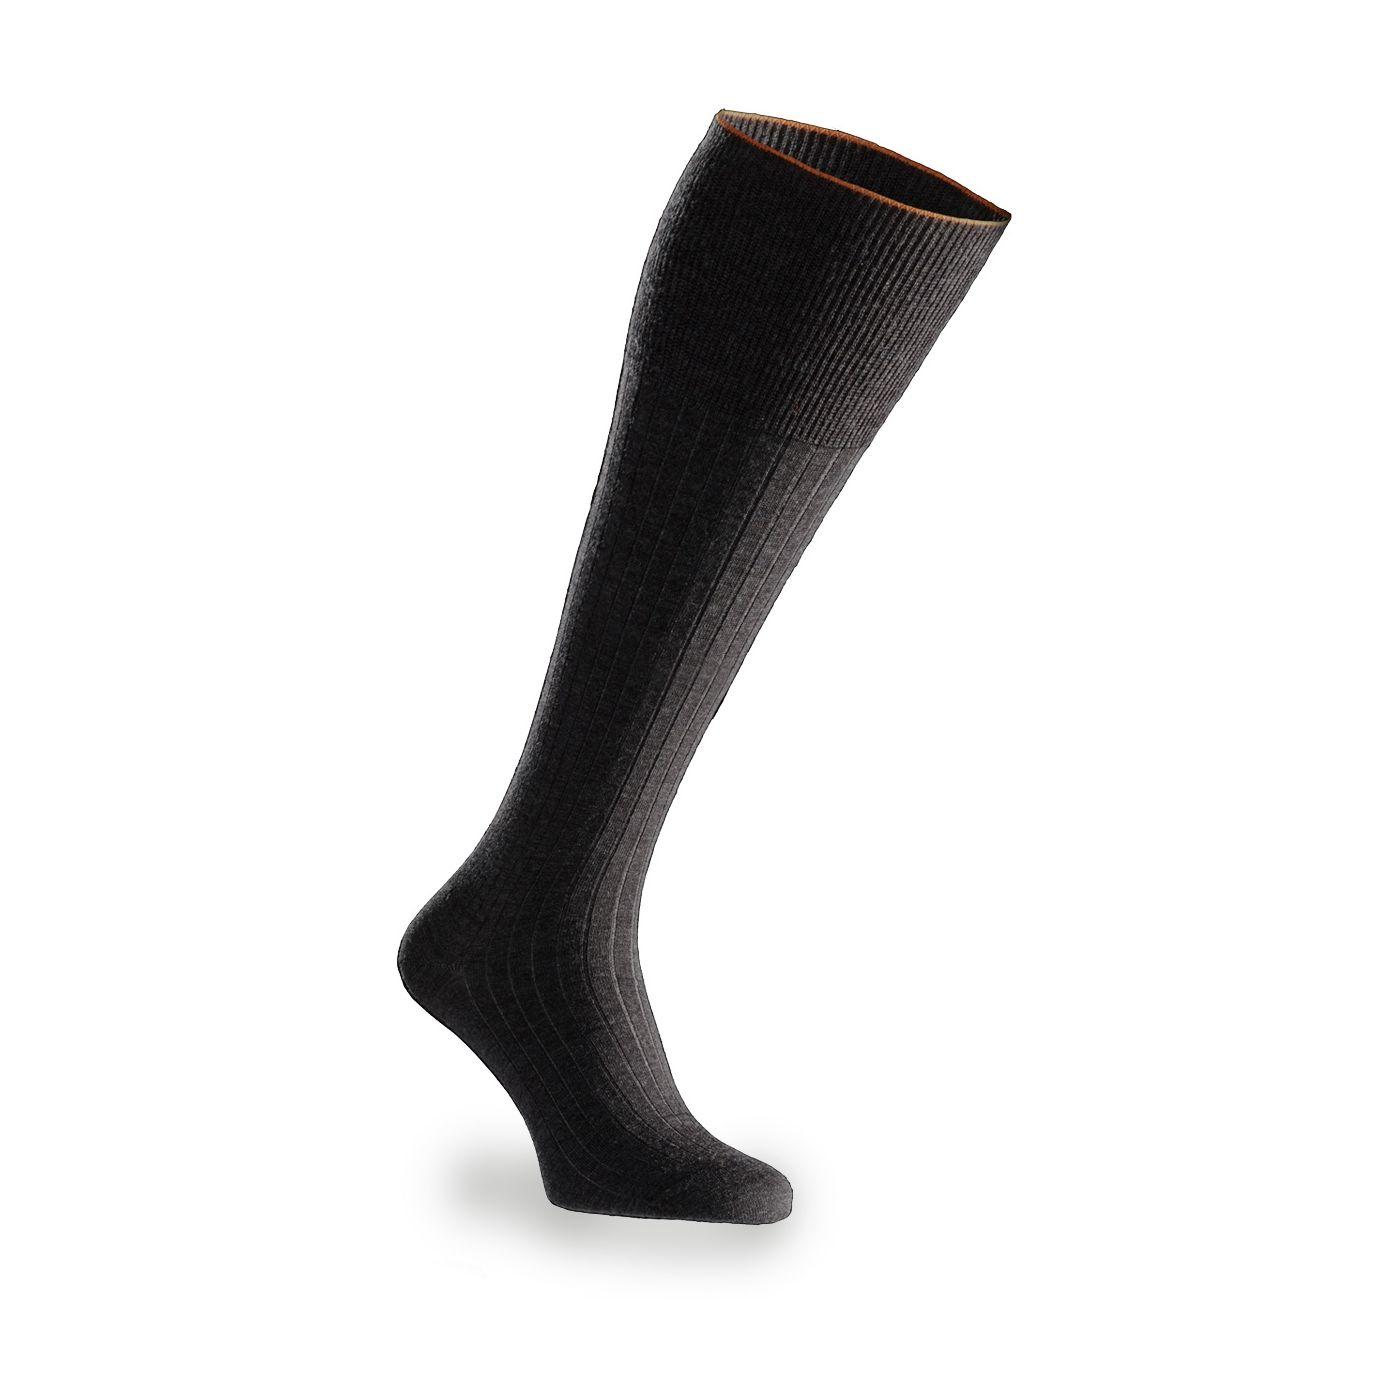 Socks for men made of Merino wool in Dark grey